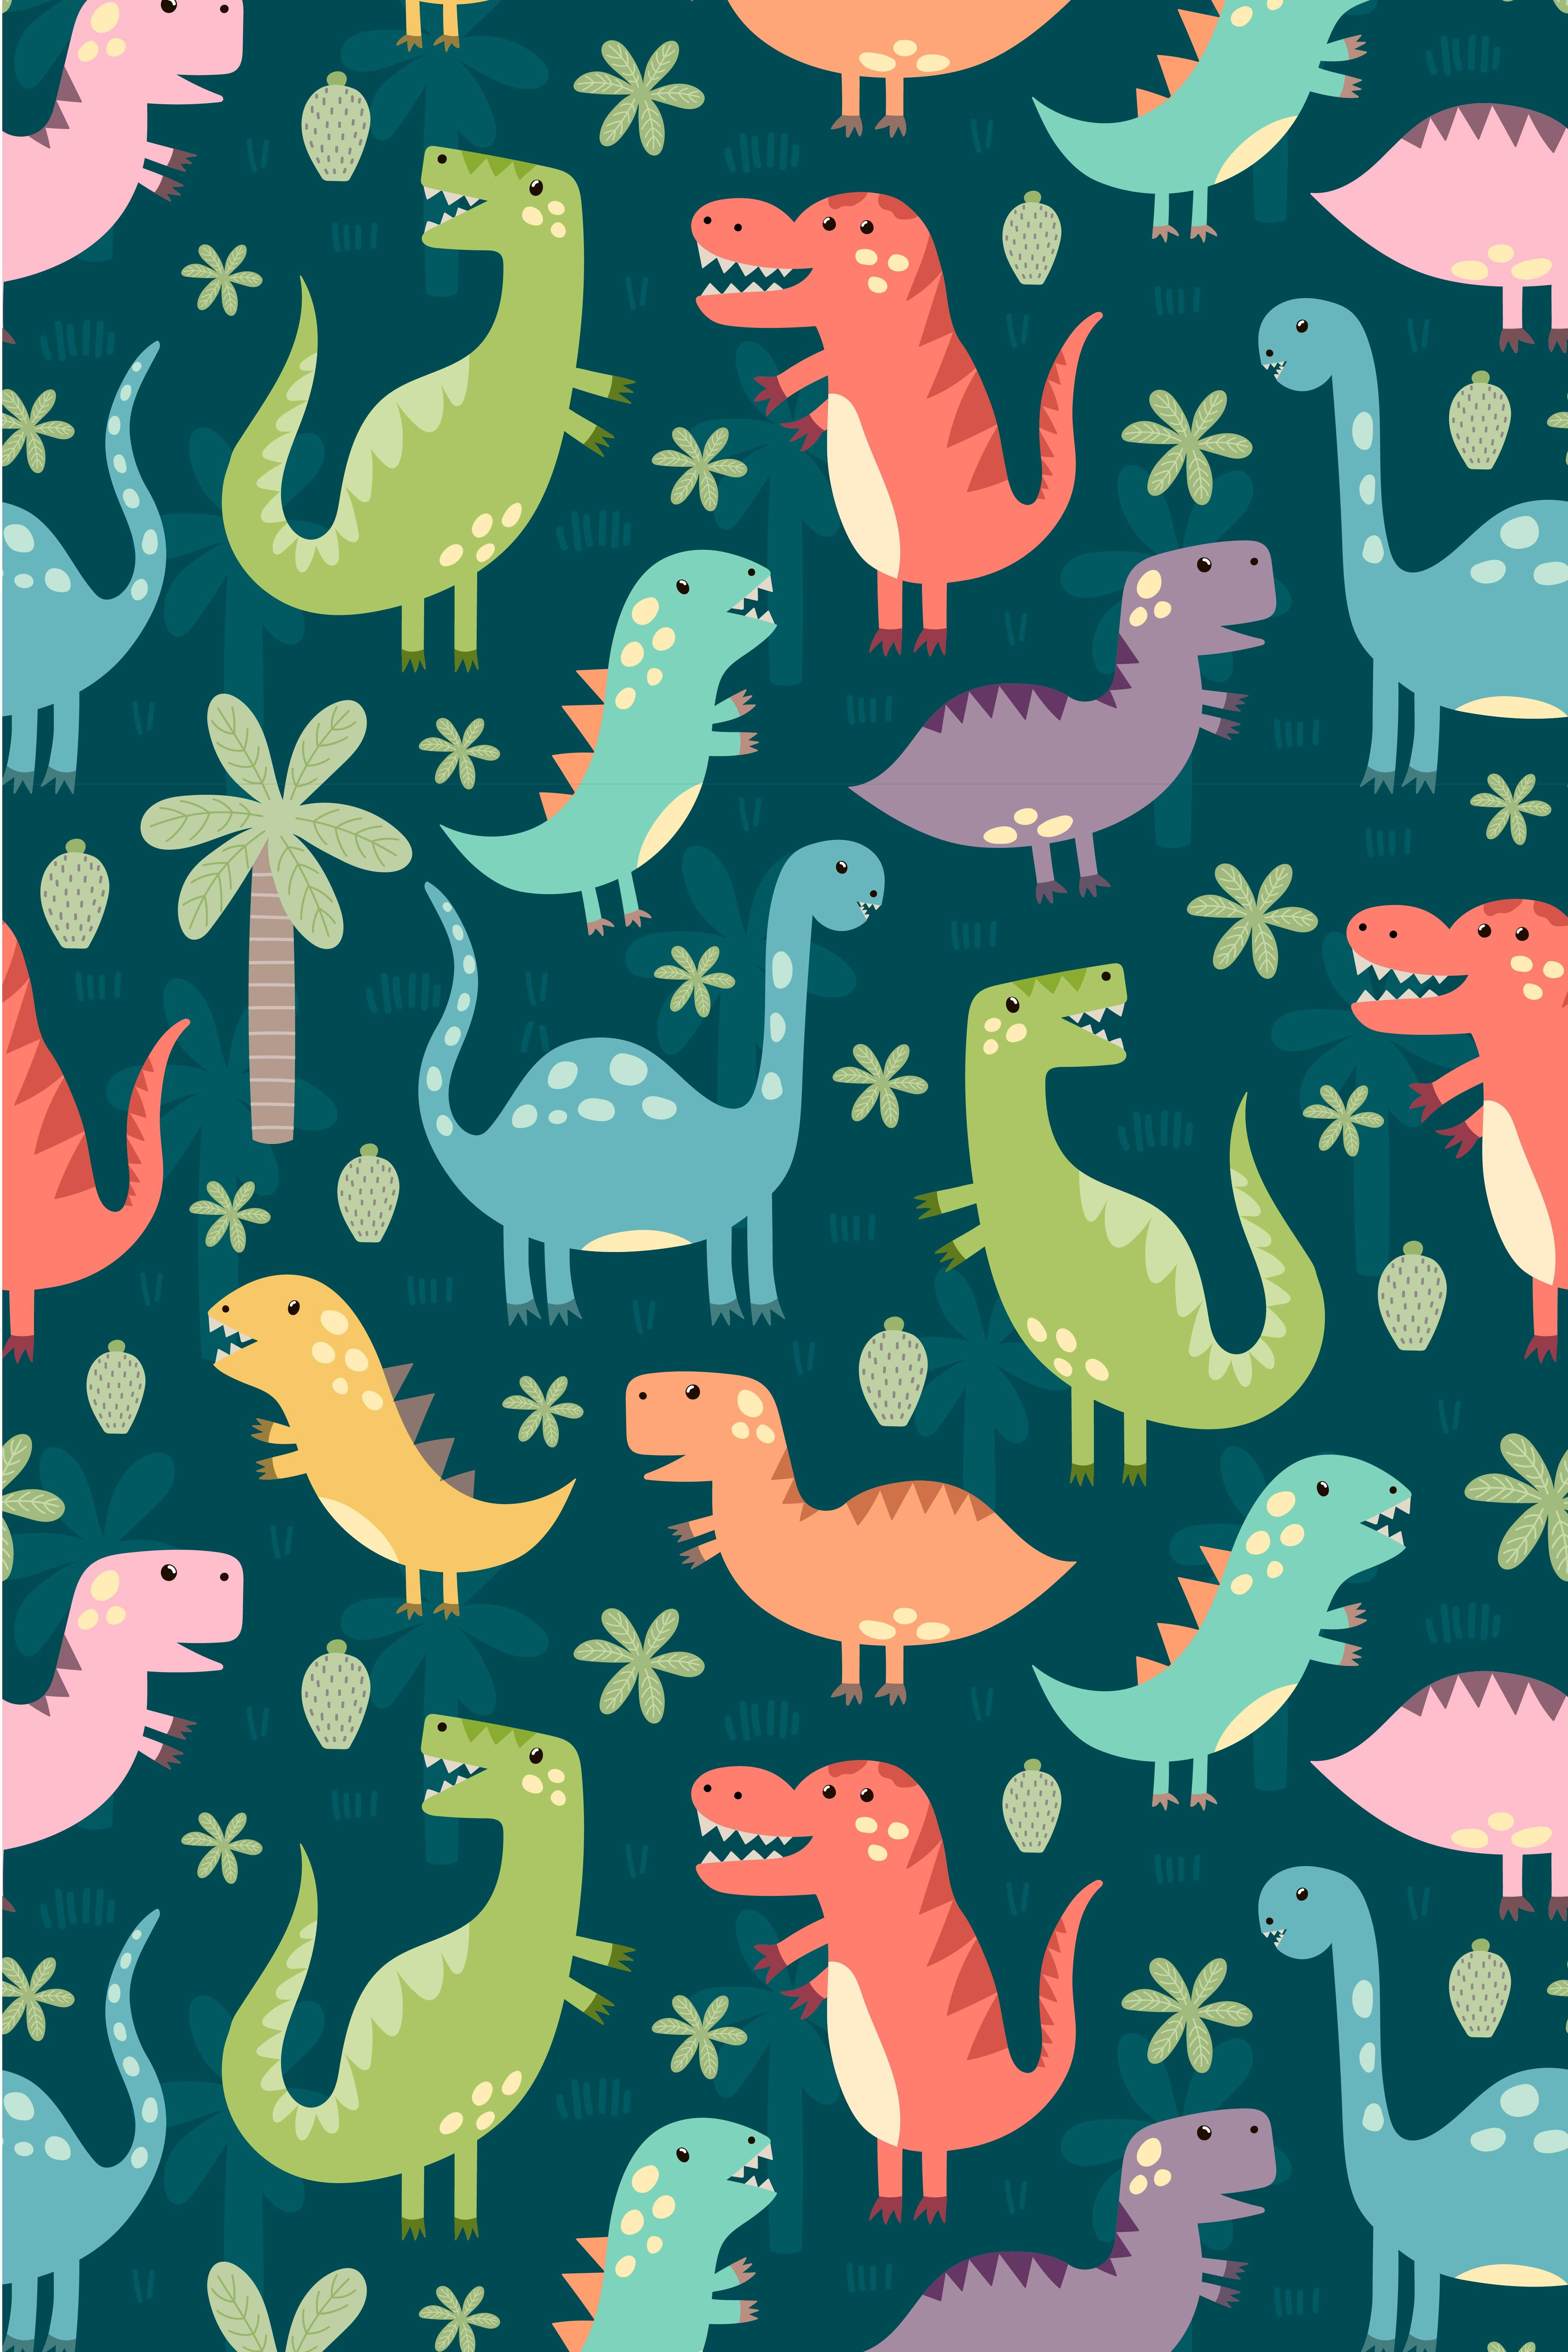 Cute dinosaurs illustration. Funny dinos art for kids. Nursery print